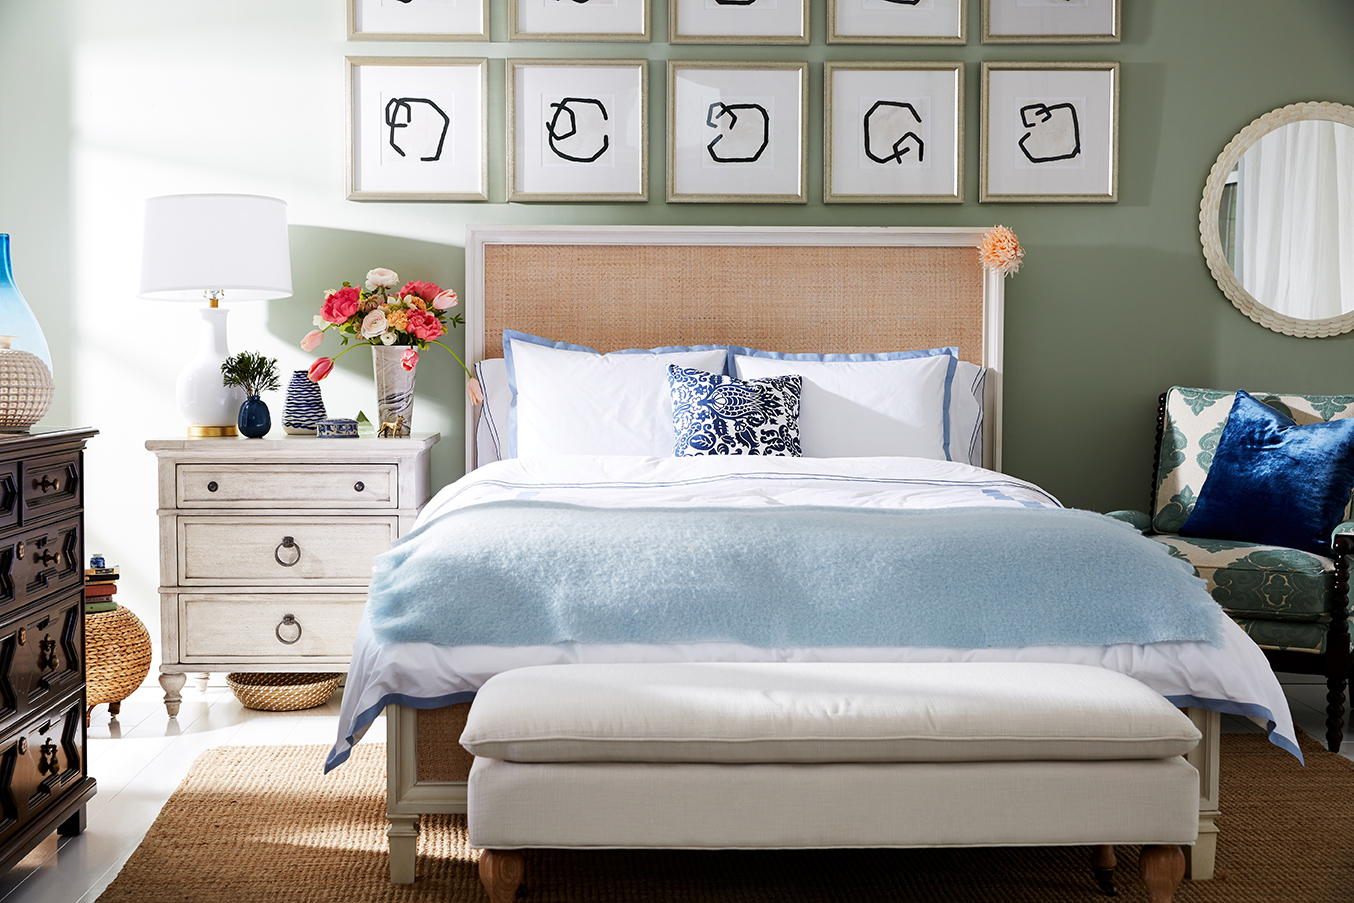 72616_LIFE-Spring-Texture-Bedroom-0419.jpg